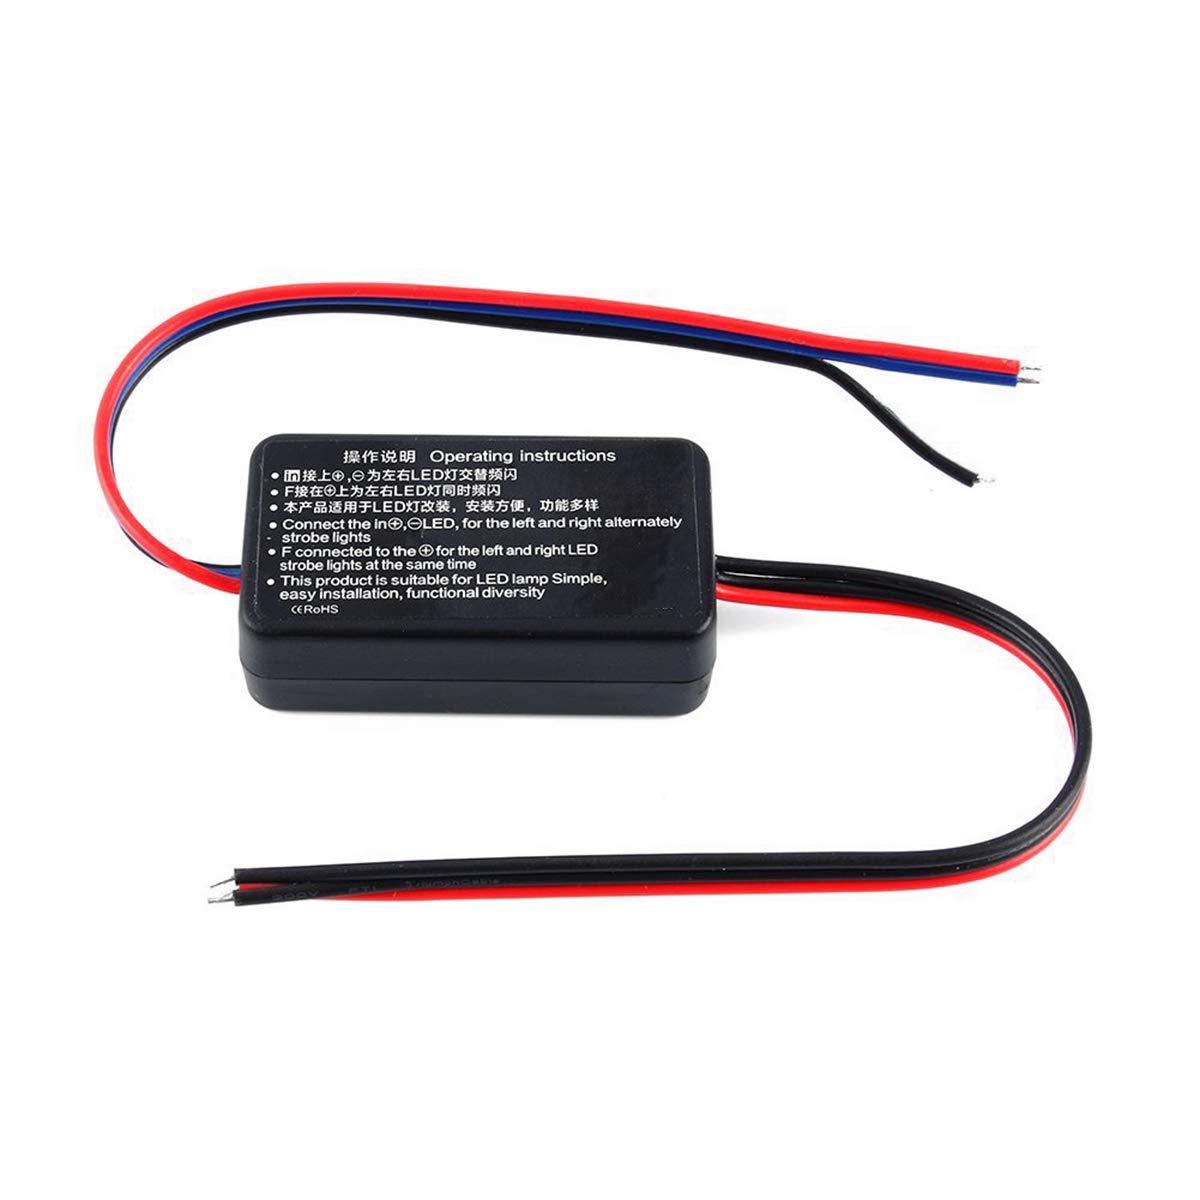 Jdmxpert Led Strobe Controller Flash Circuit Amazon Account Pinterest Box Flasher Module Universal Fit For Brake Stop Tail Light 12v Gs 100a 1 Set